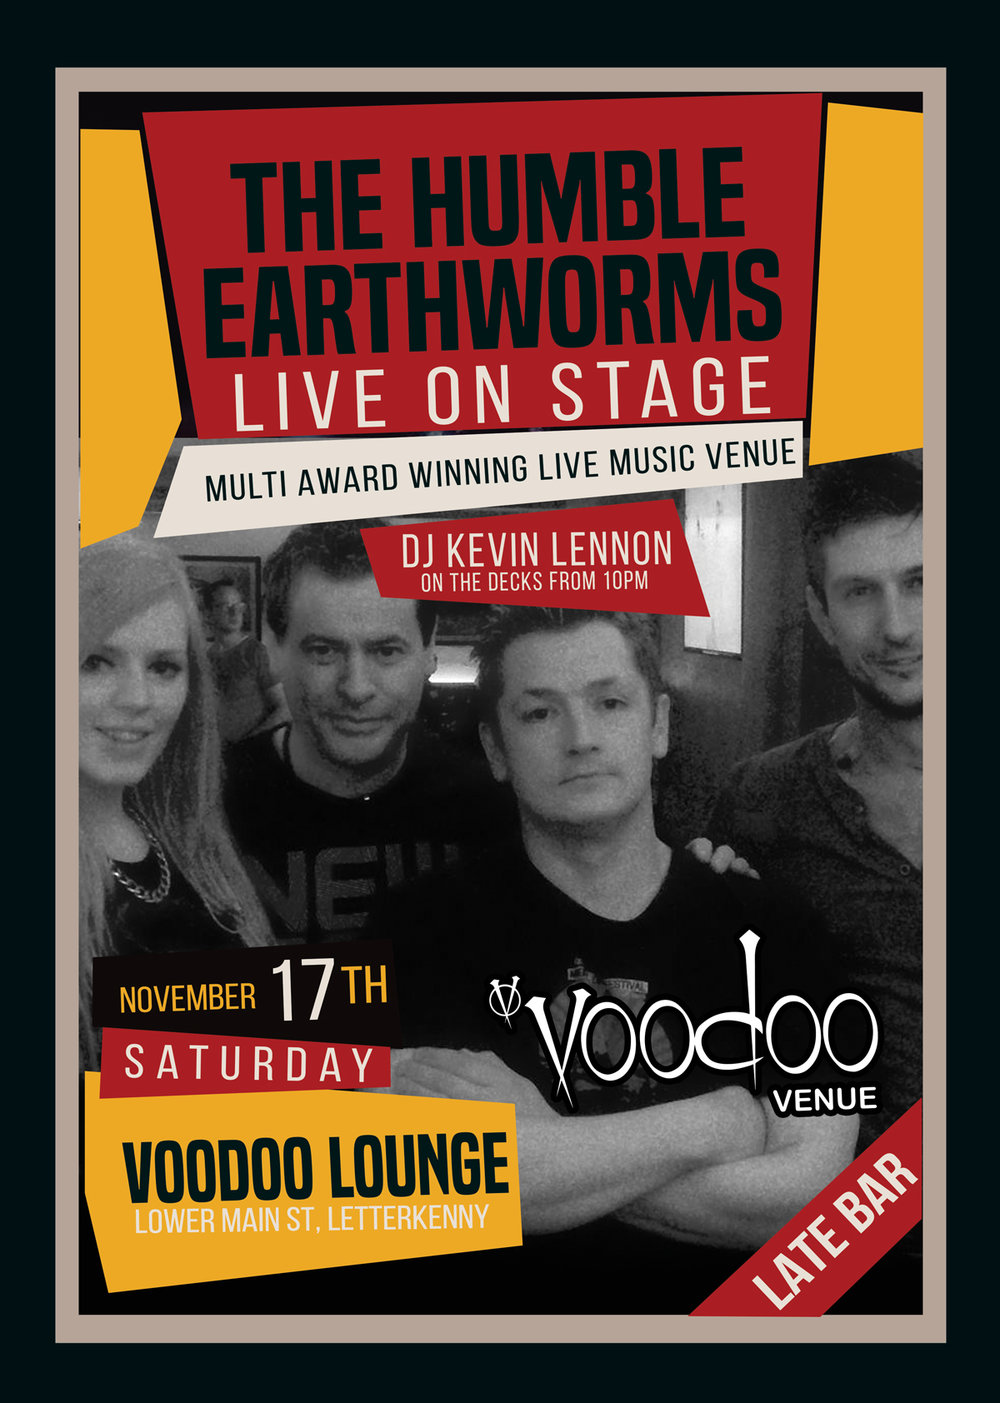 VOODOO-VENUE---humble-earthworms-sat-nov-17-2018.jpg